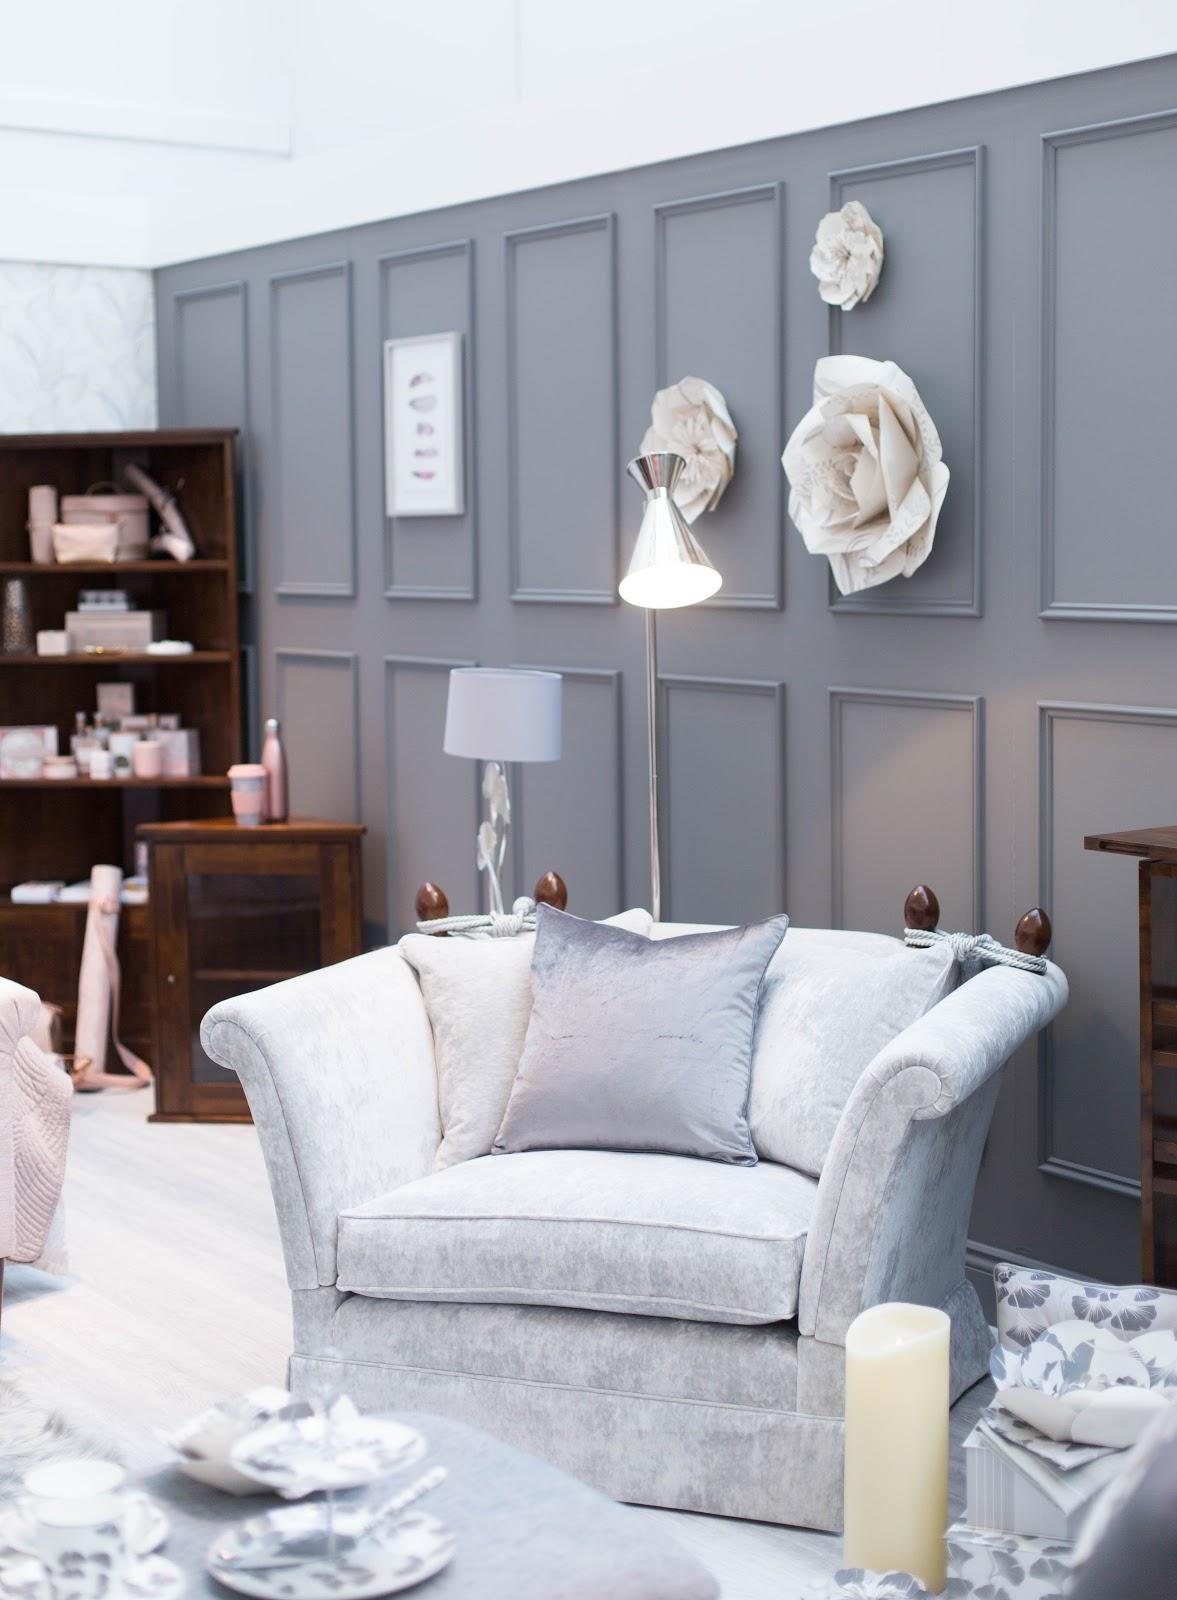 Laura ashley press show ss17 finnterior designer for Ashley room planner